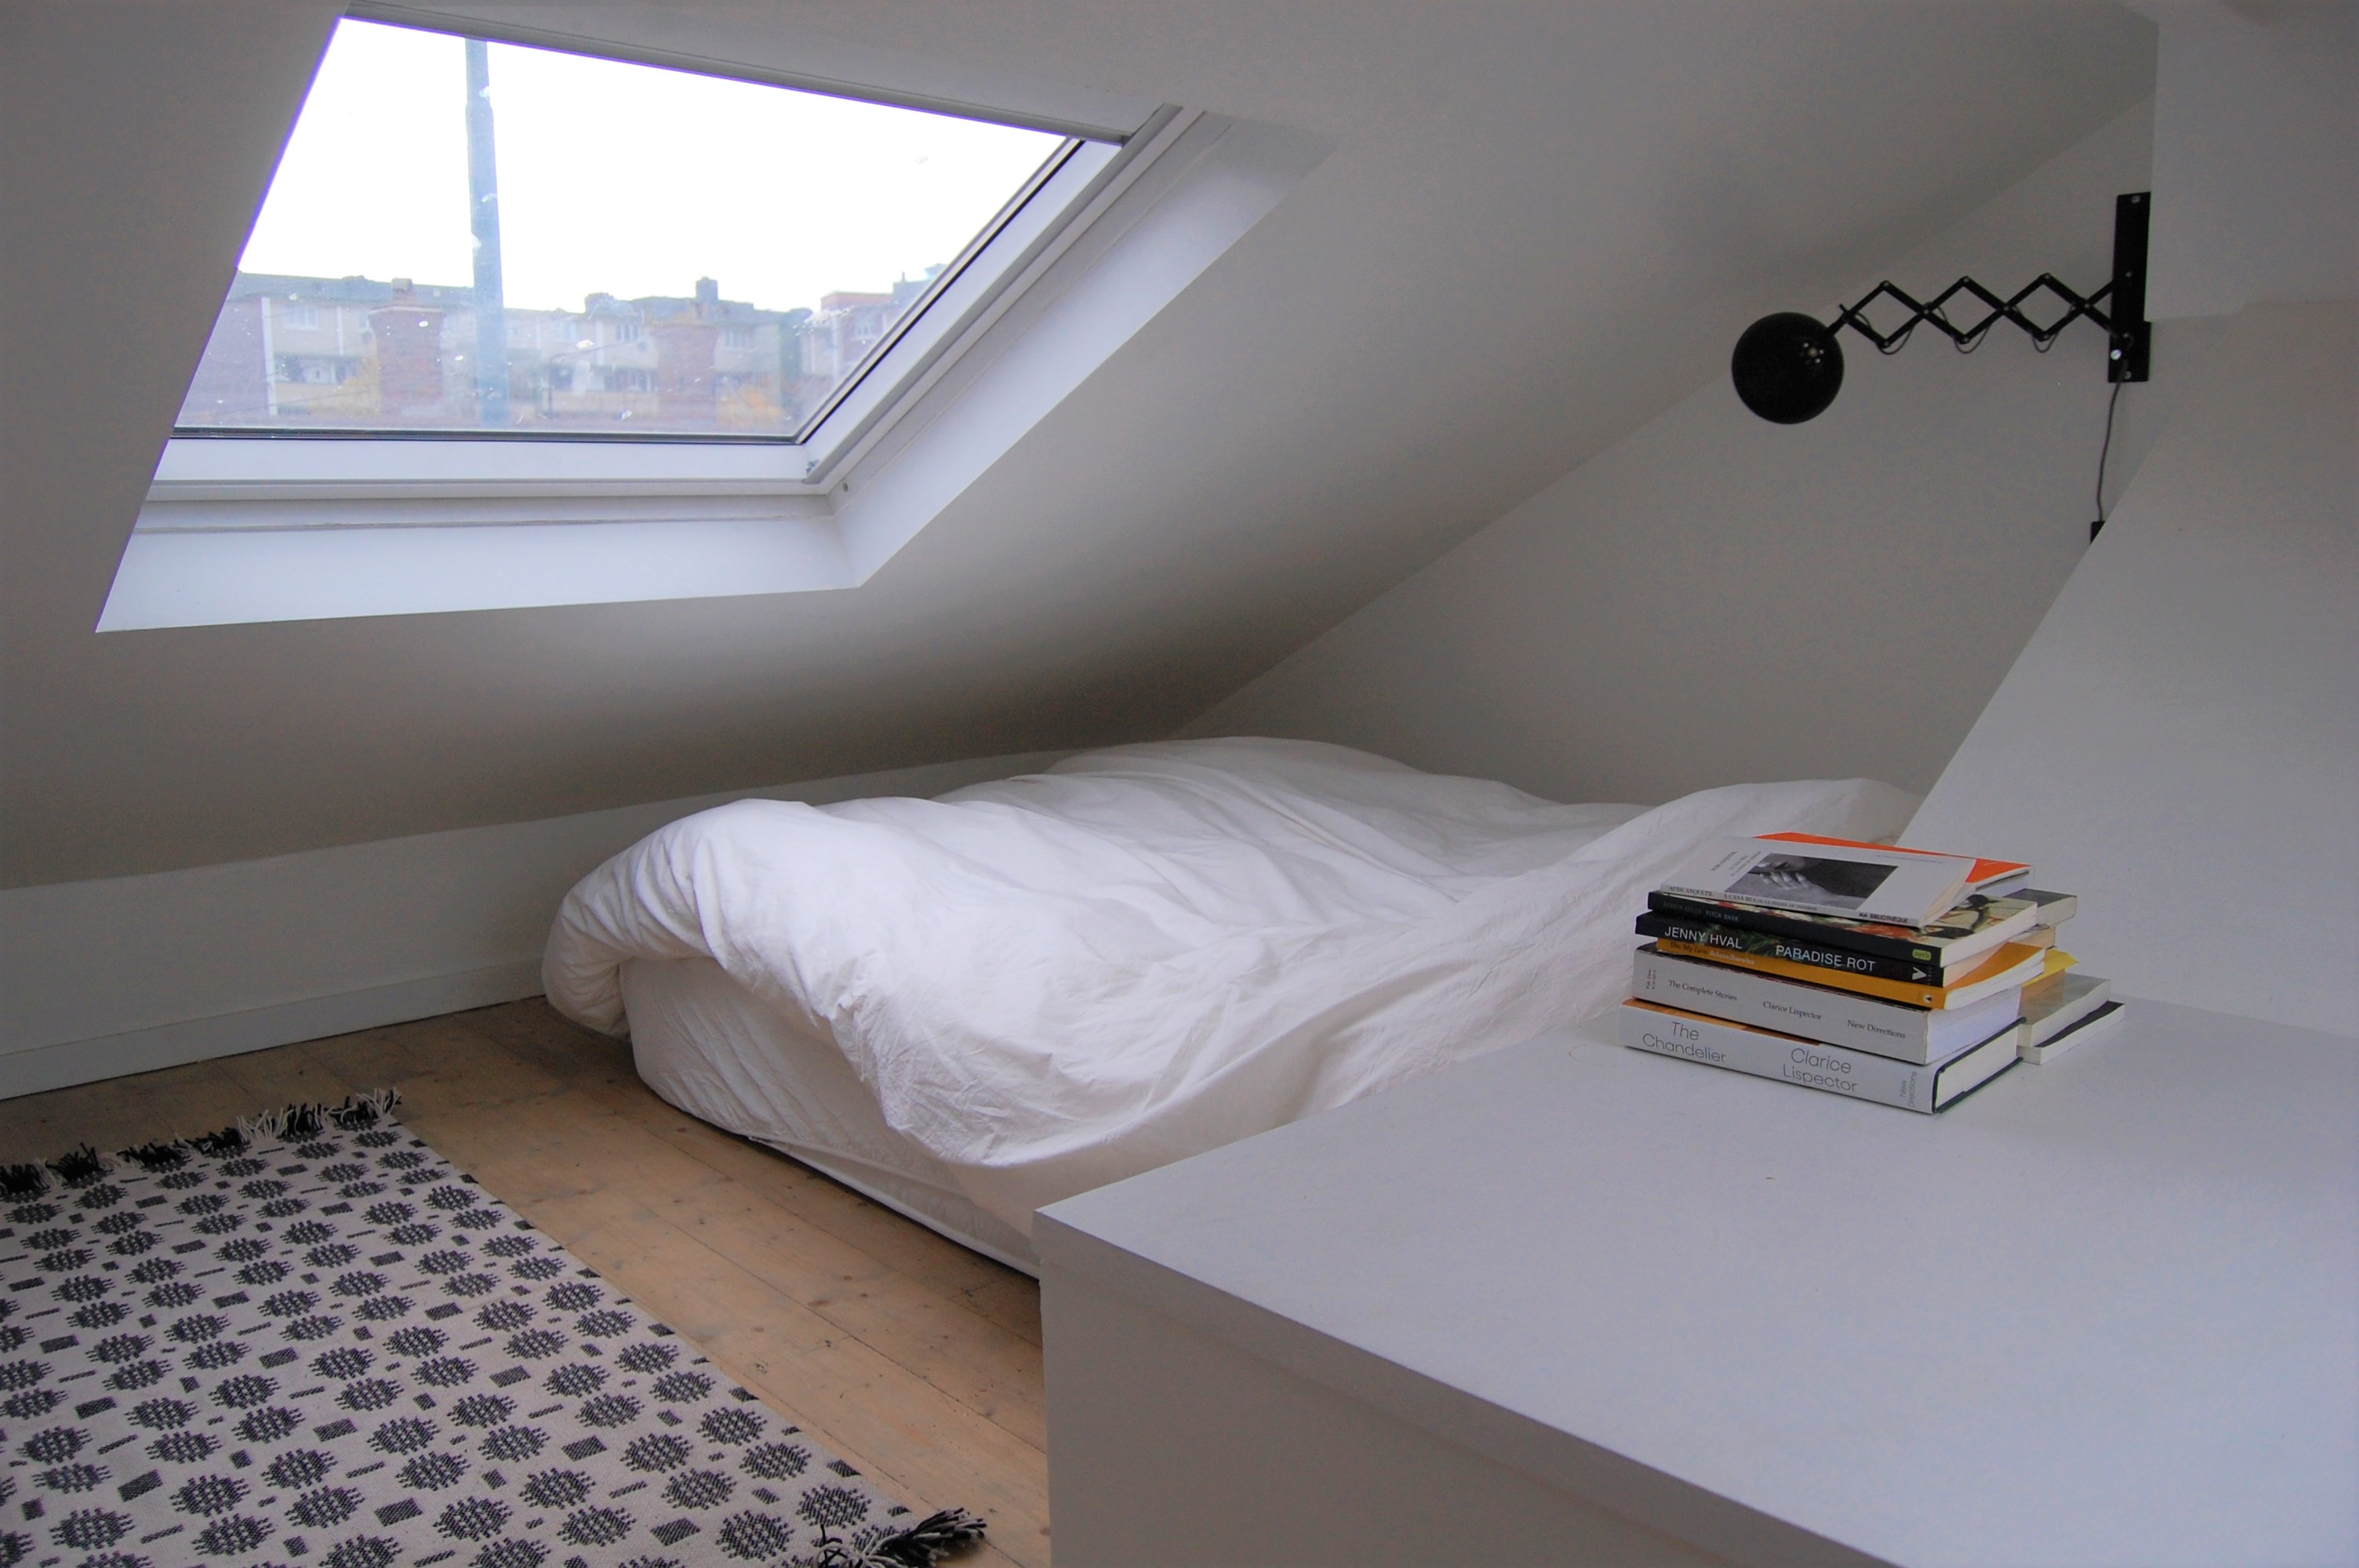 Mezzanine Used as Sleeping Area